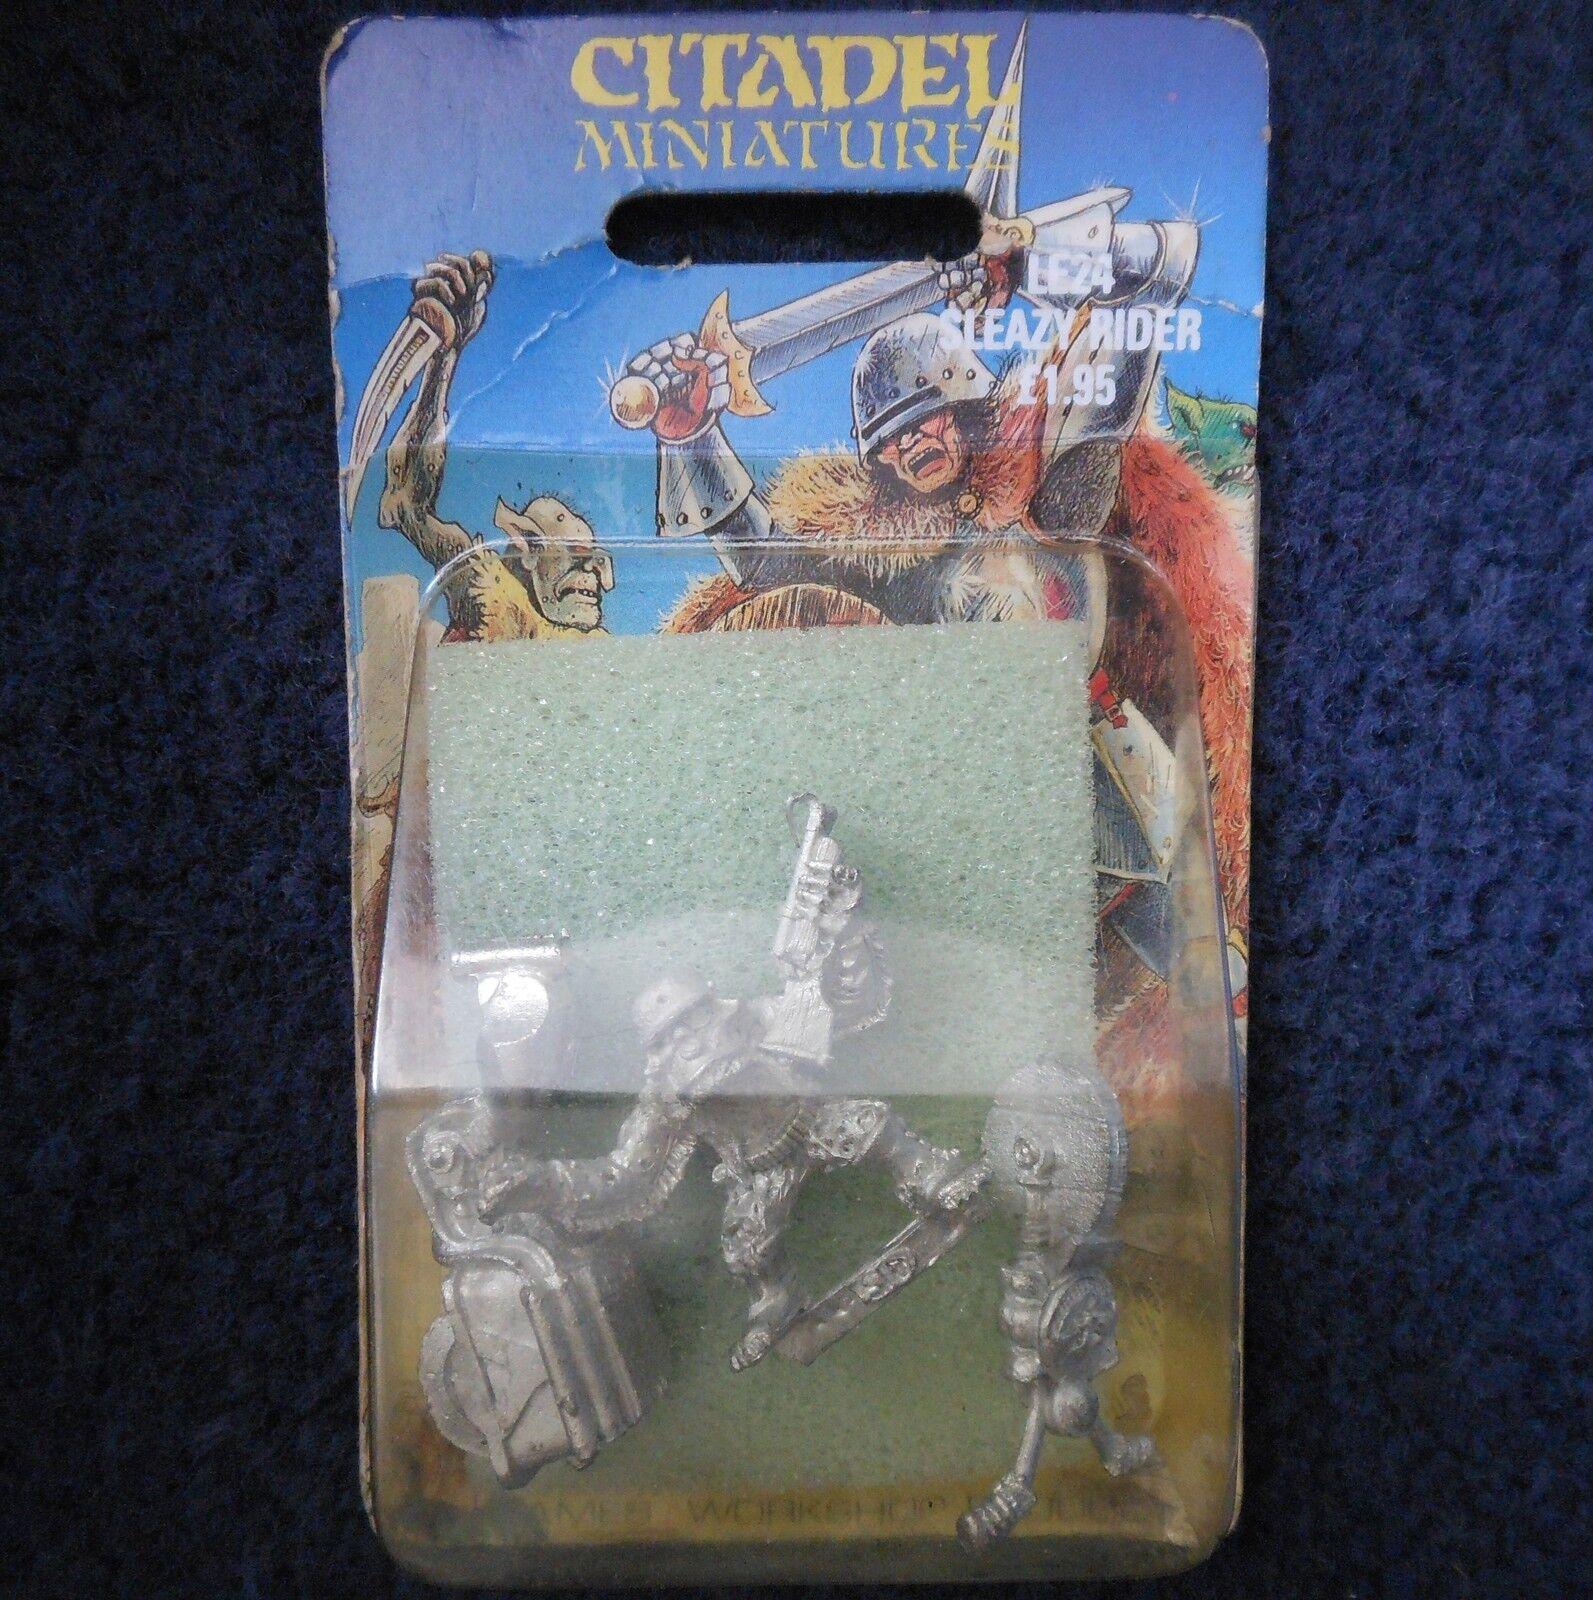 1987 LE24 sleazy rider limited edition citadel warhammer rogue trader 40K mib gw